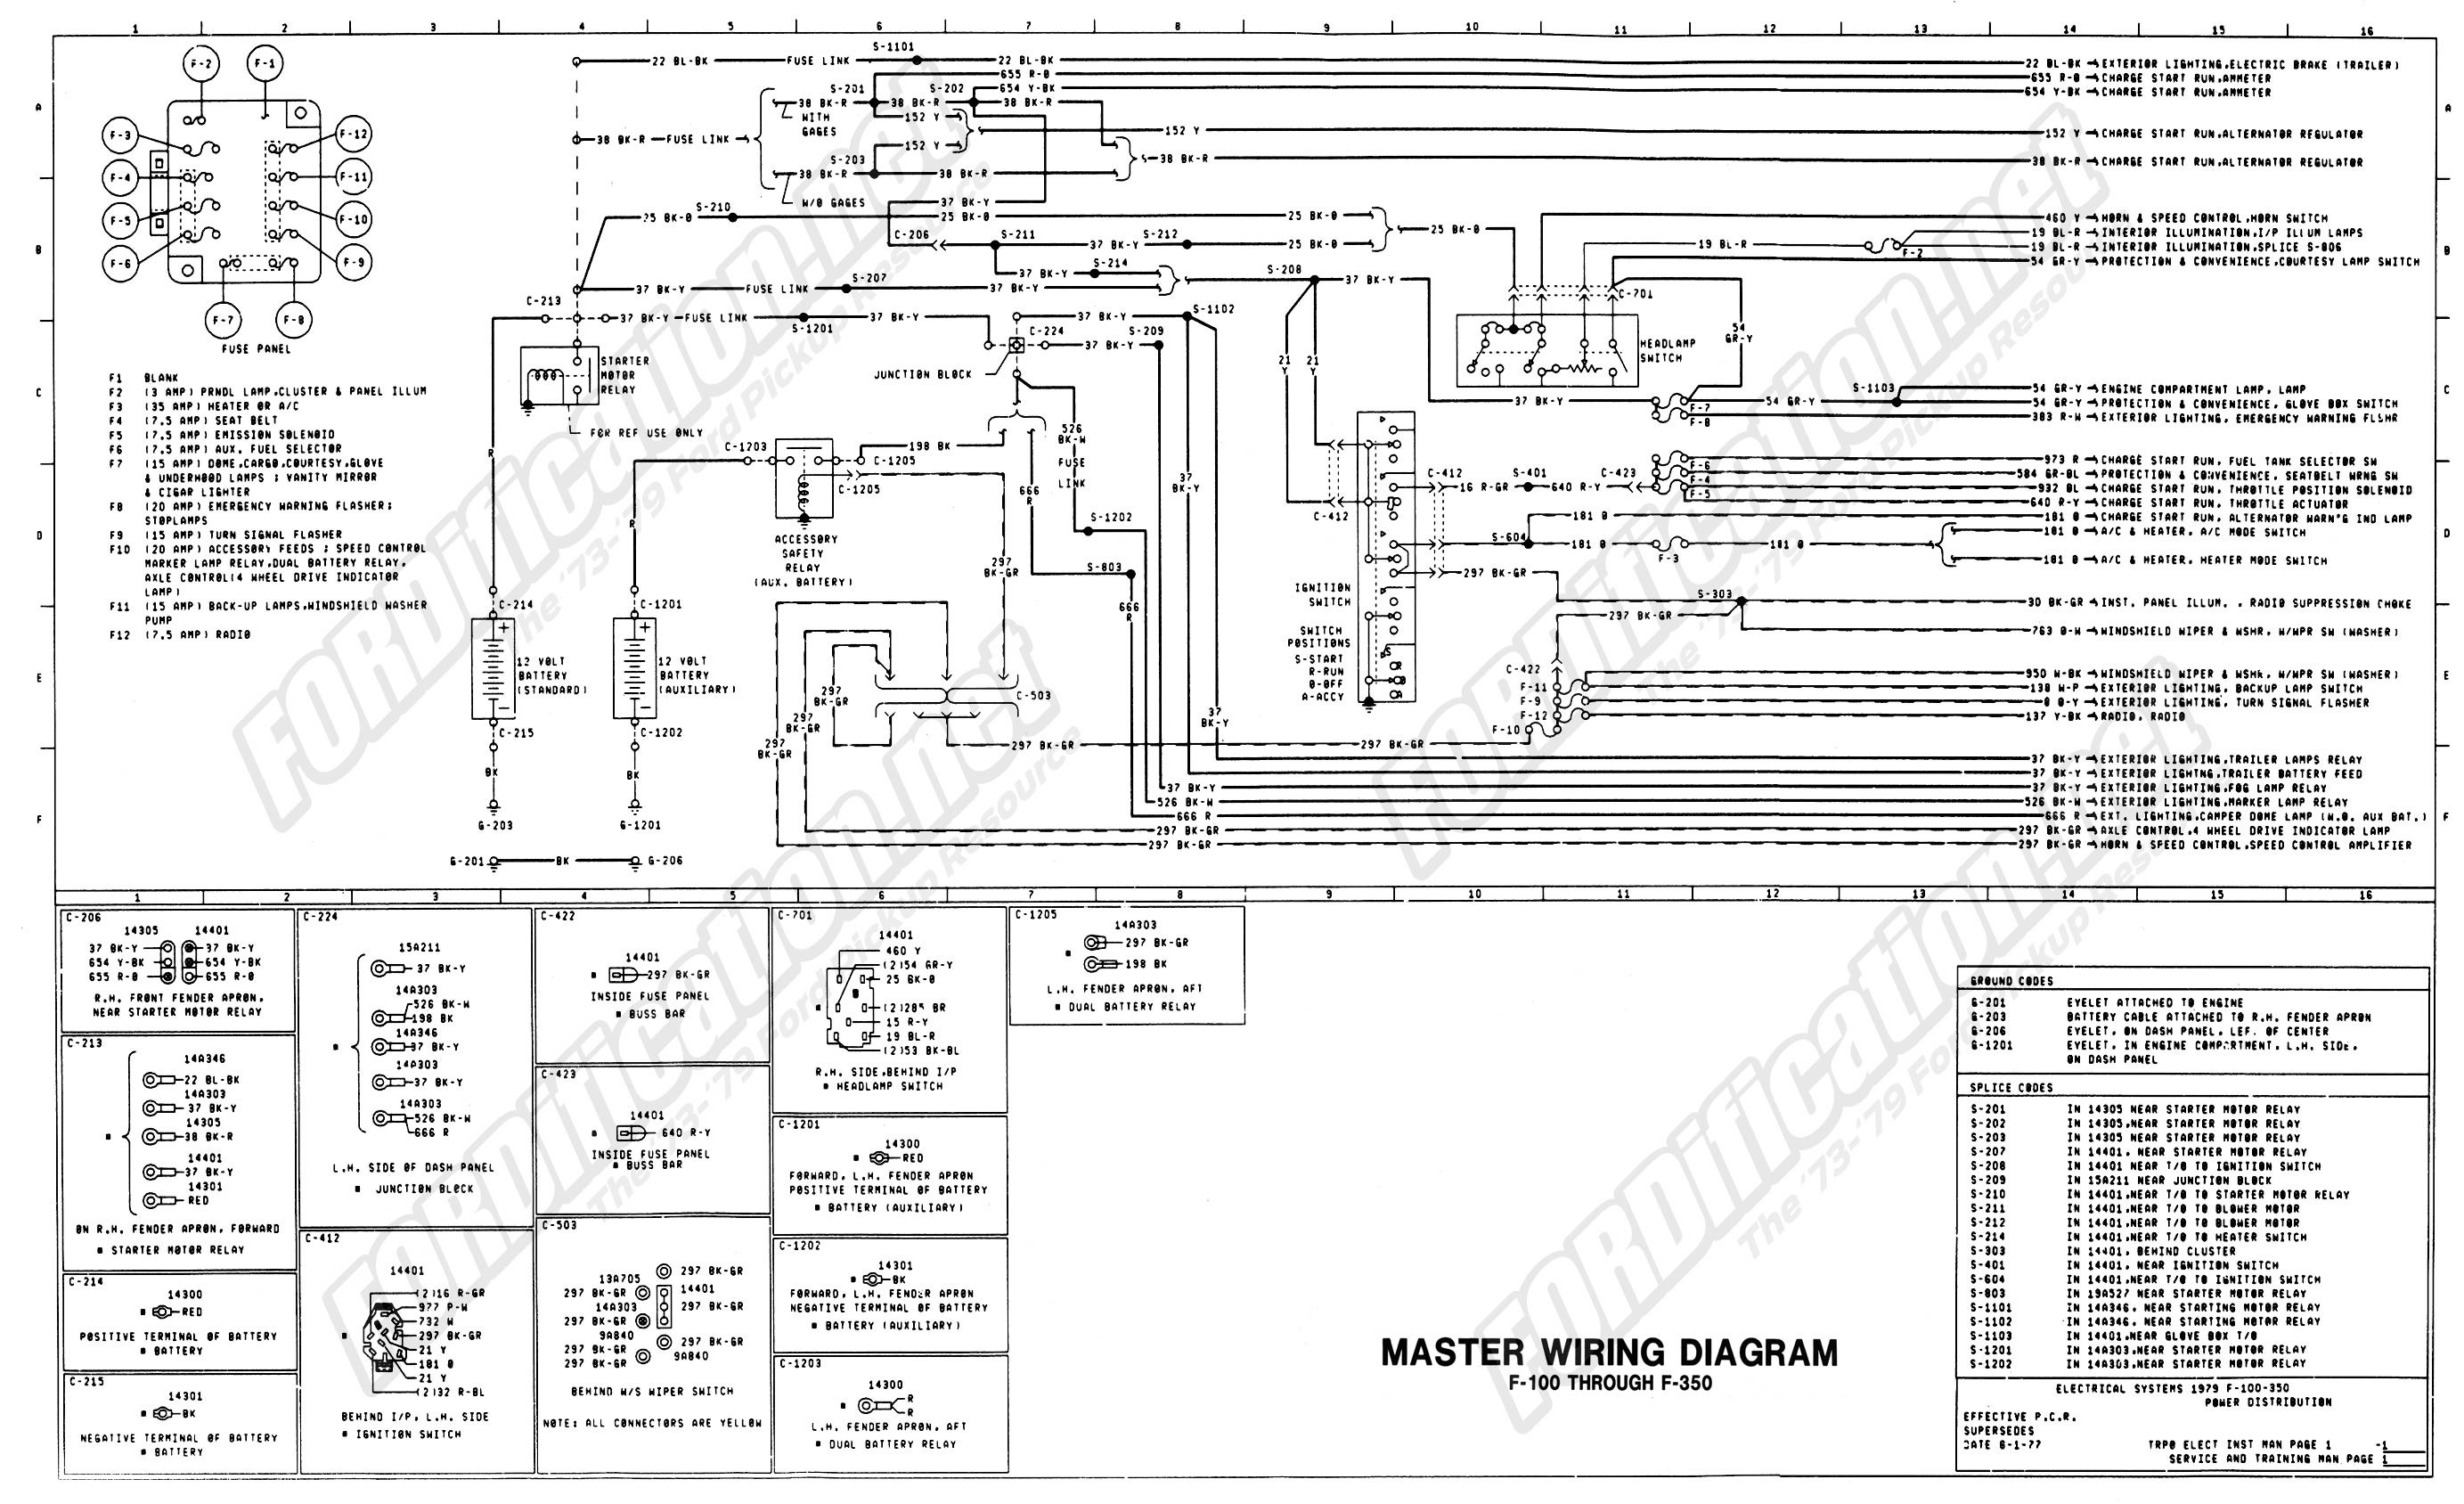 2000 ford F150 Wiring Diagram Sterling Wiring Diagram Wiring Diagram Of 2000 ford F150 Wiring Diagram